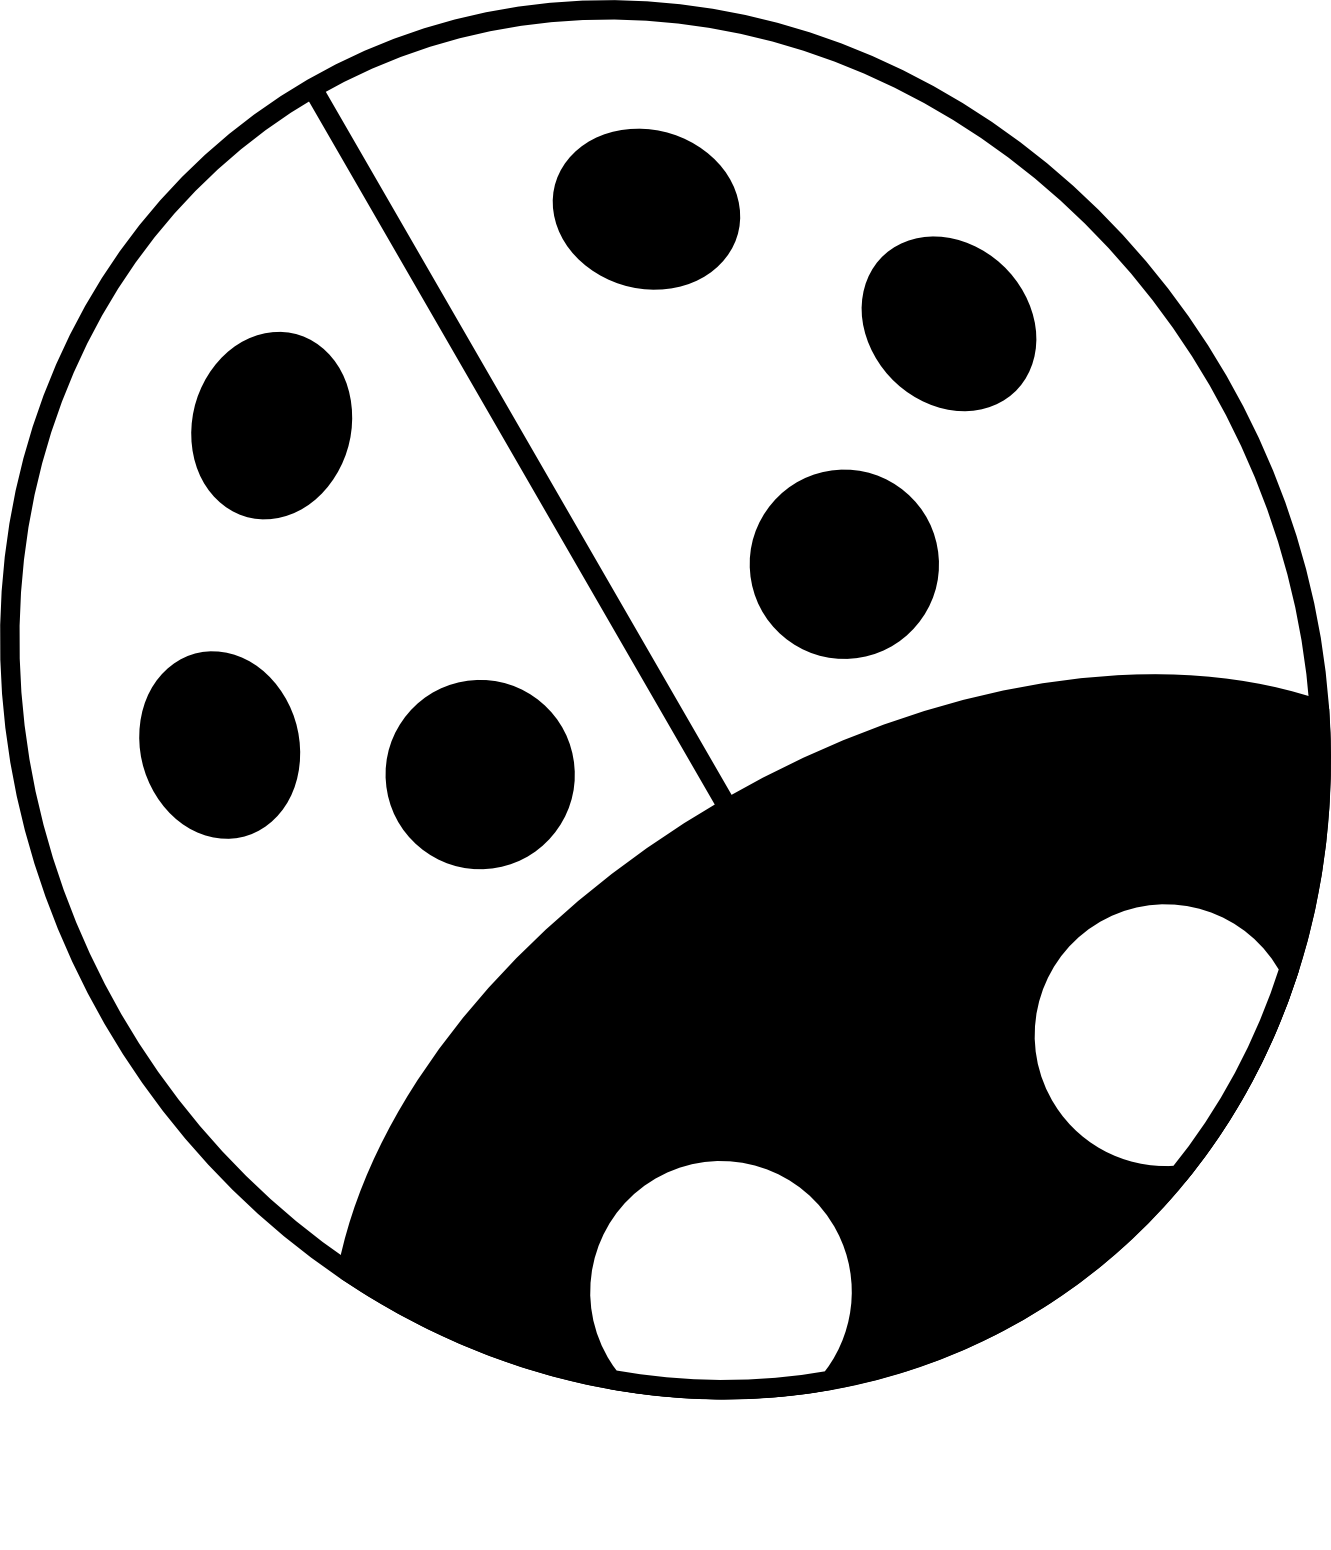 1331x1550 Ladybug Clipart Black And White Clipart Panda